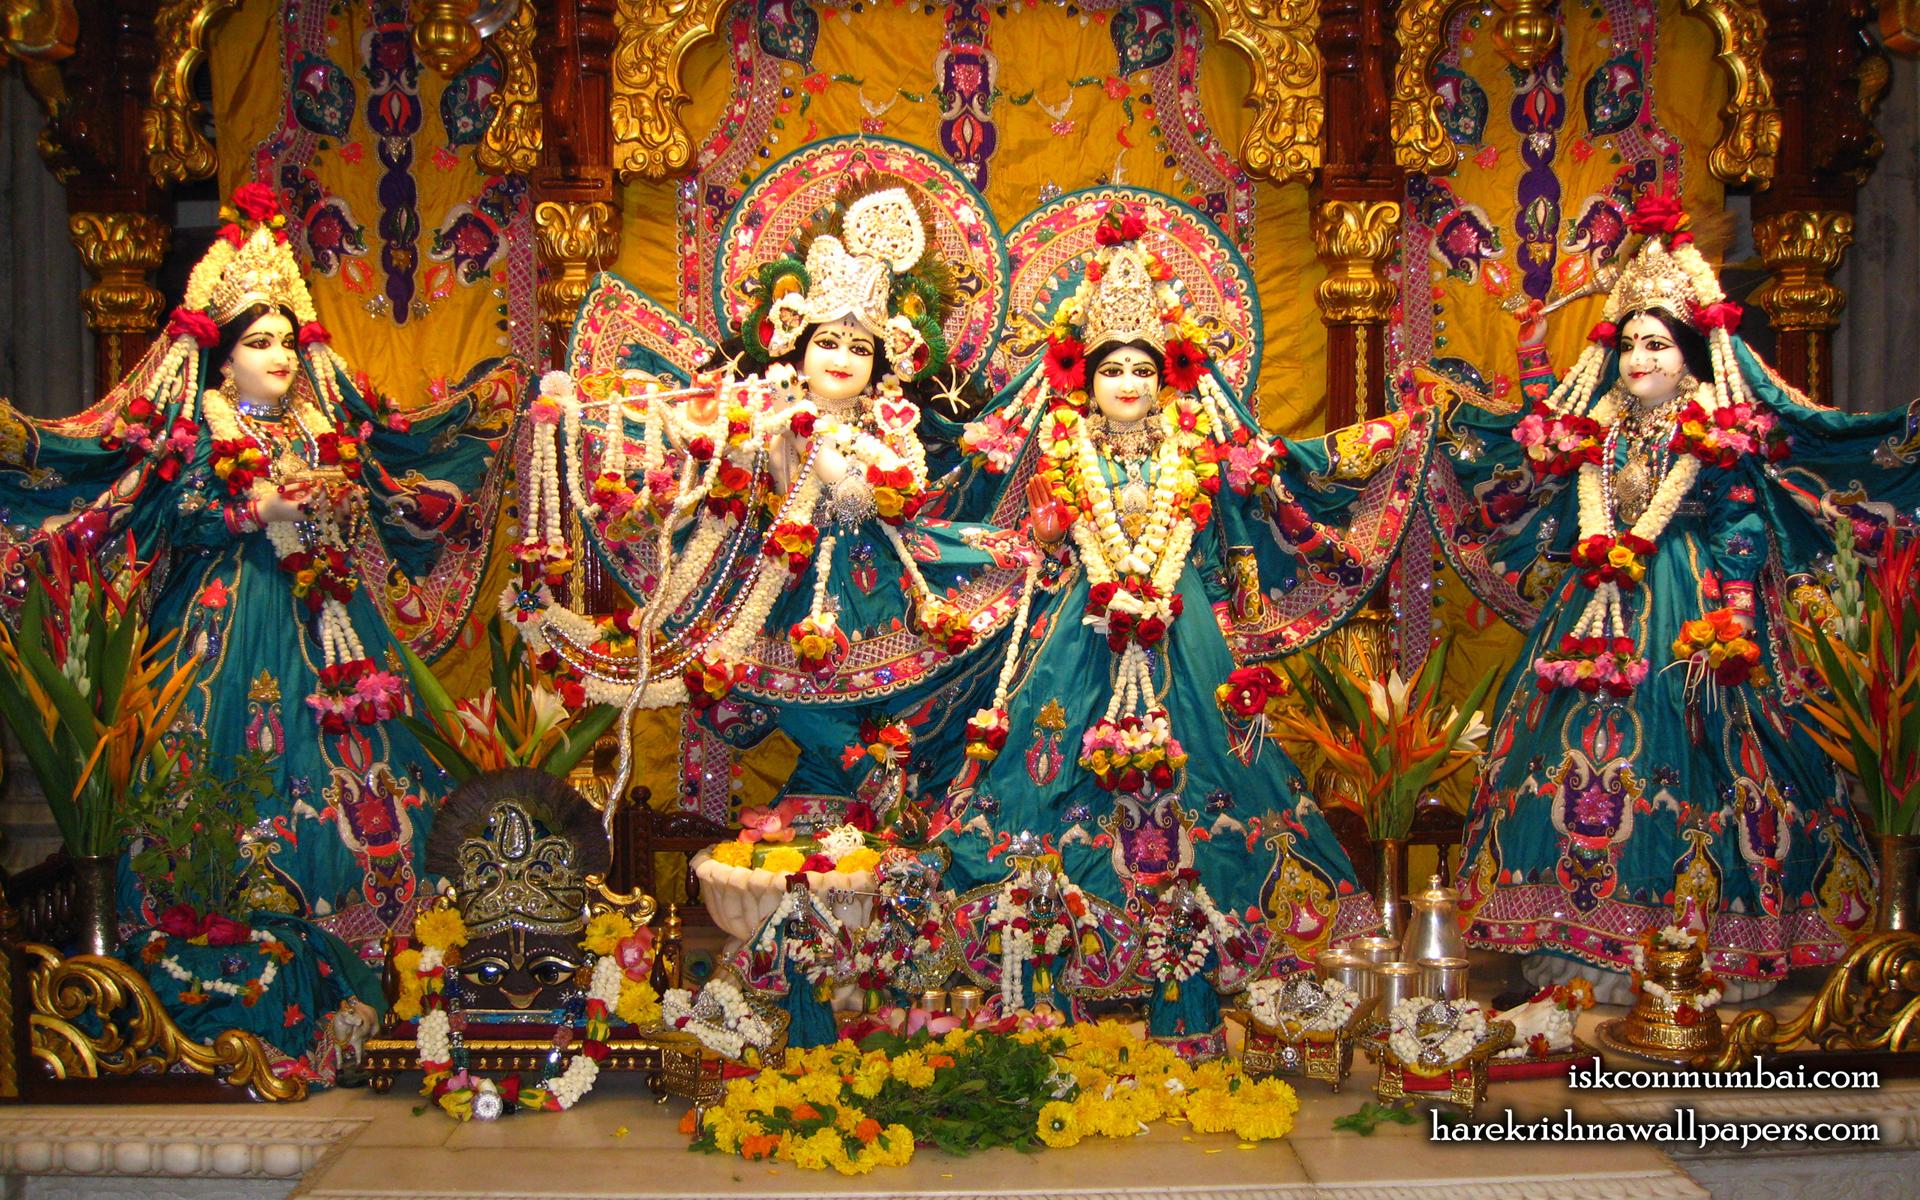 Sri Sri Radha Rasabihari Lalita Vishakha Wallpaper (003) Size 1920x1200 Download